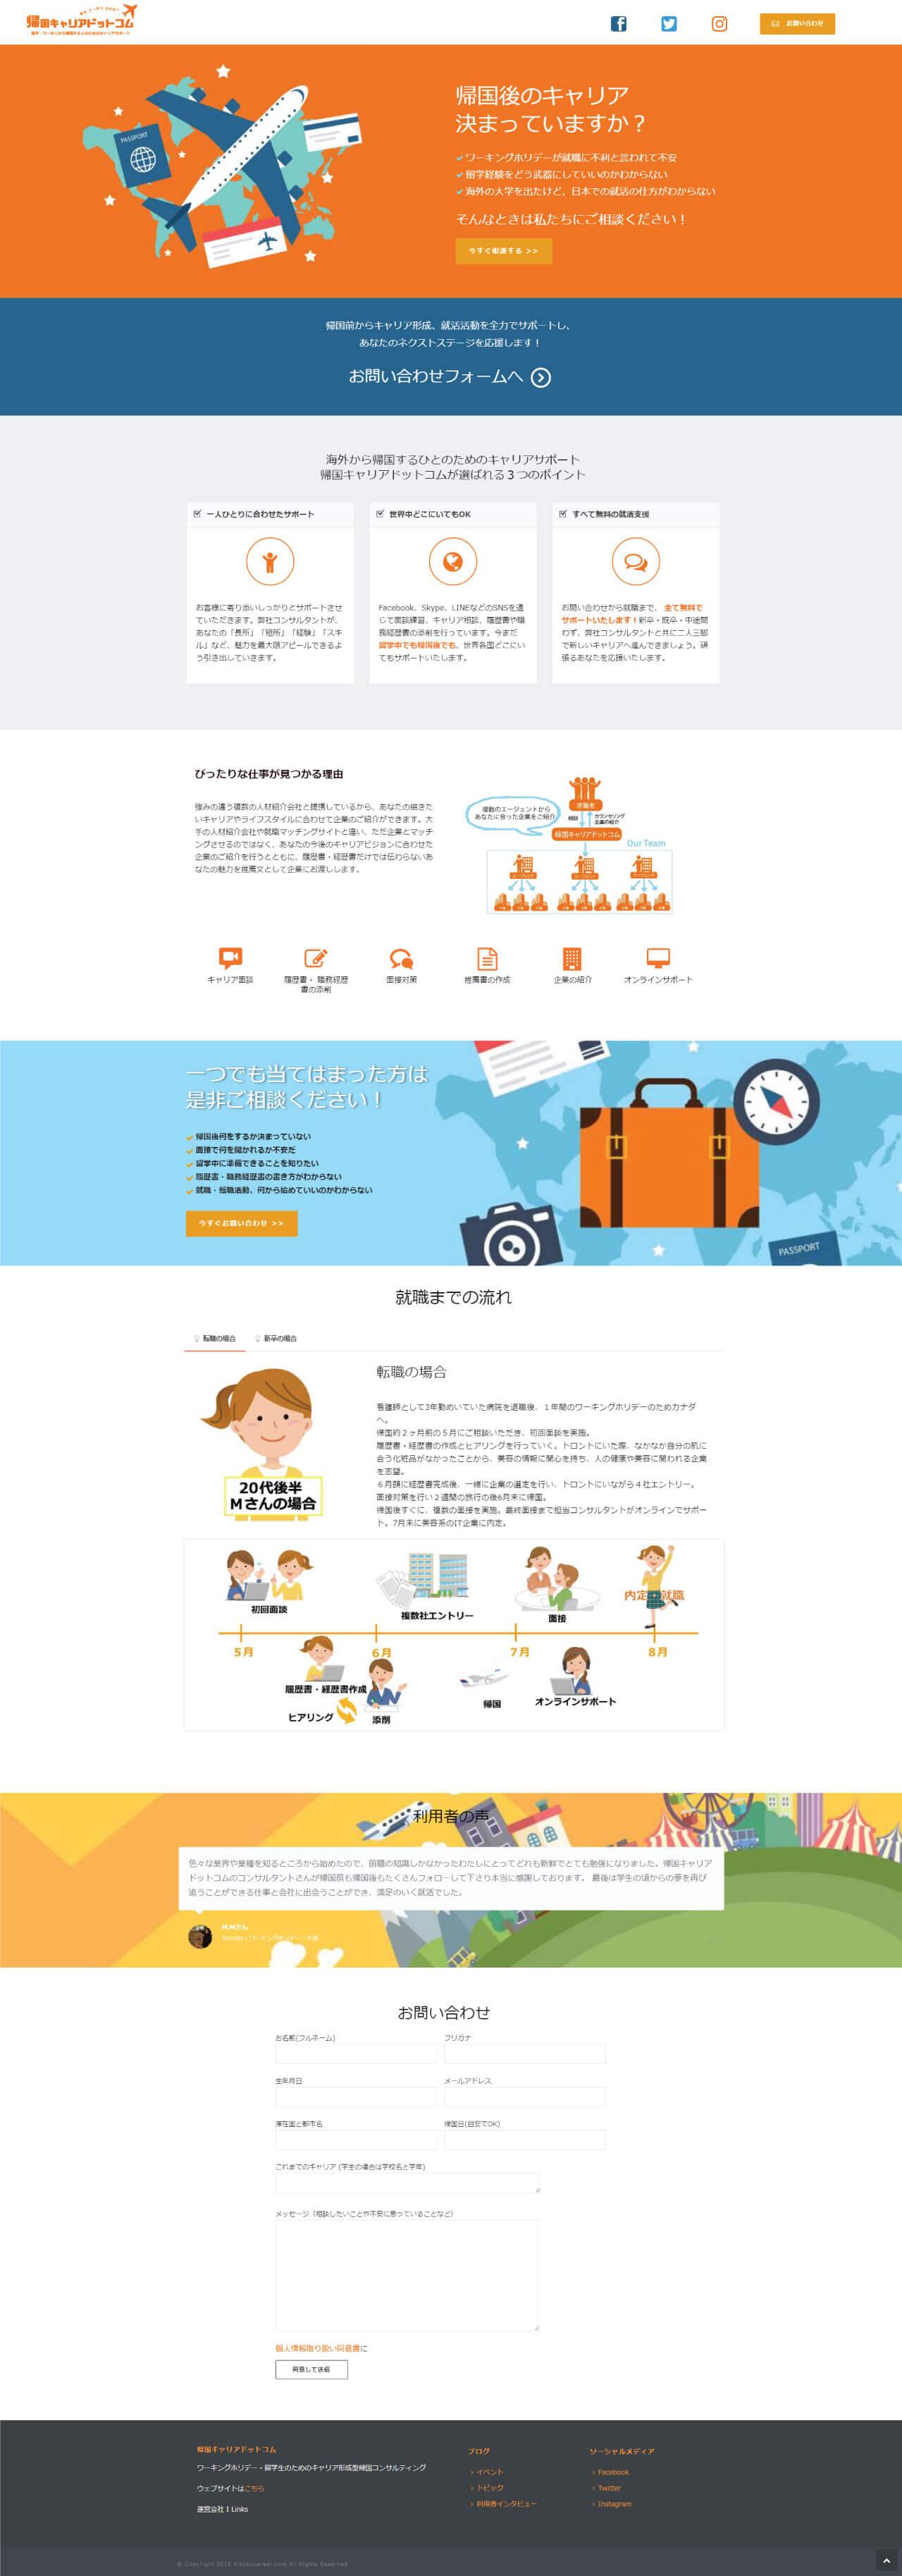 kikokucareer sample homepage